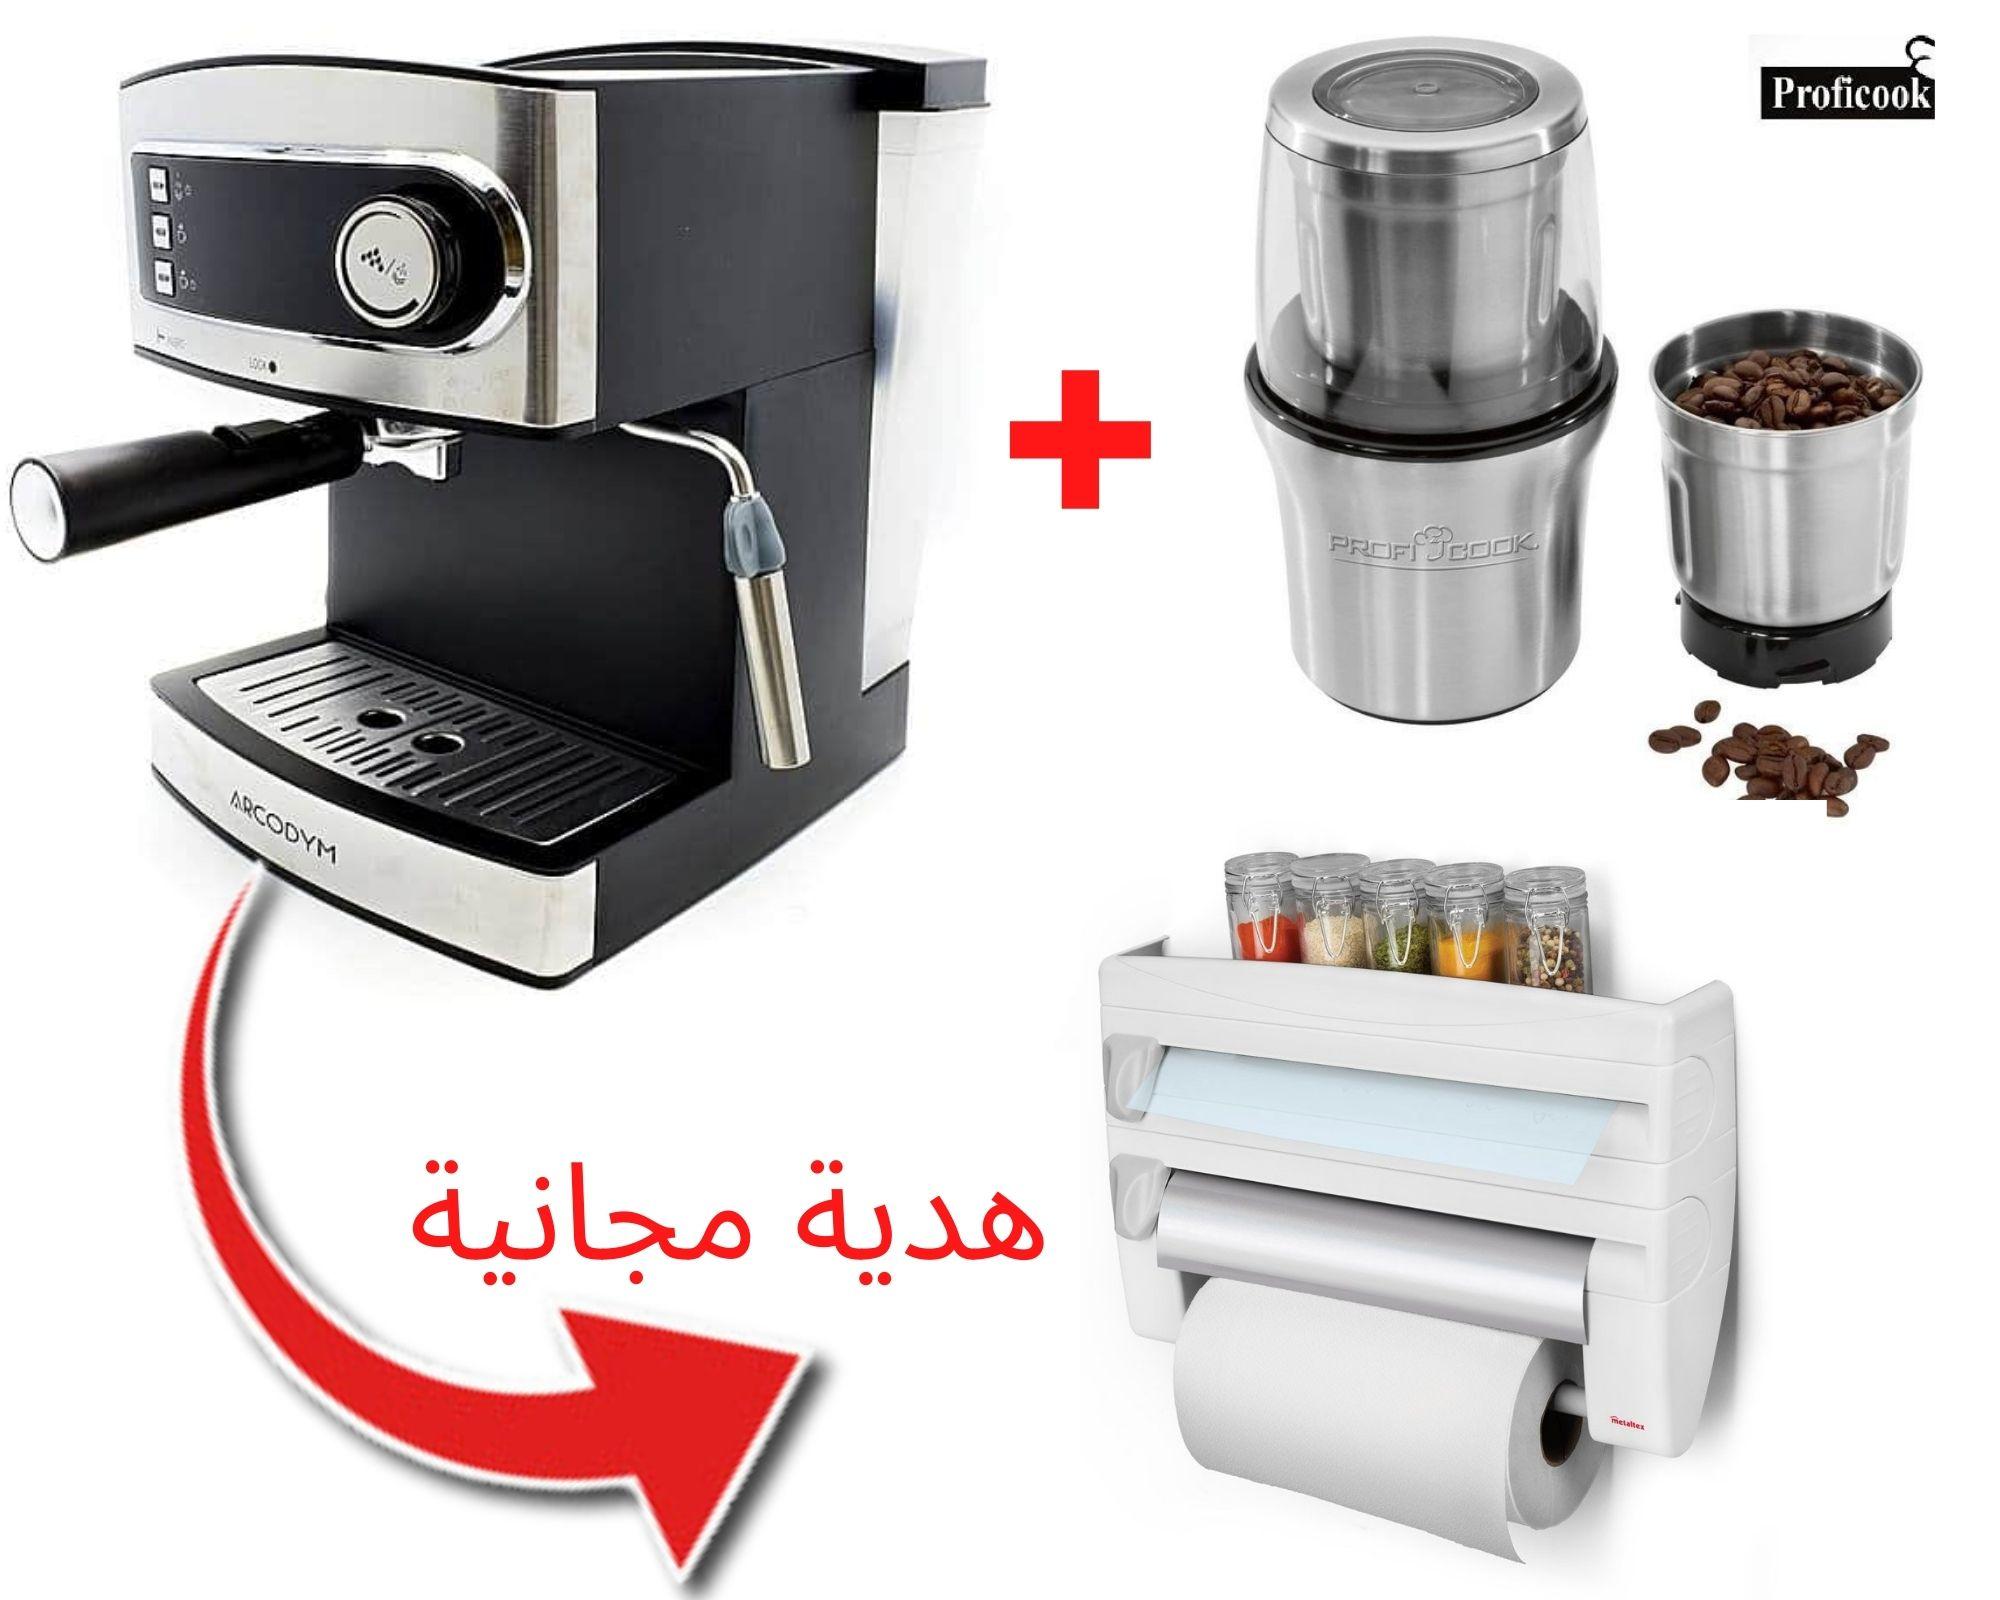 pack promo: MACHINE À CAFÉ ARCODYM + moulin a cafe proficook + Roll Cadeau